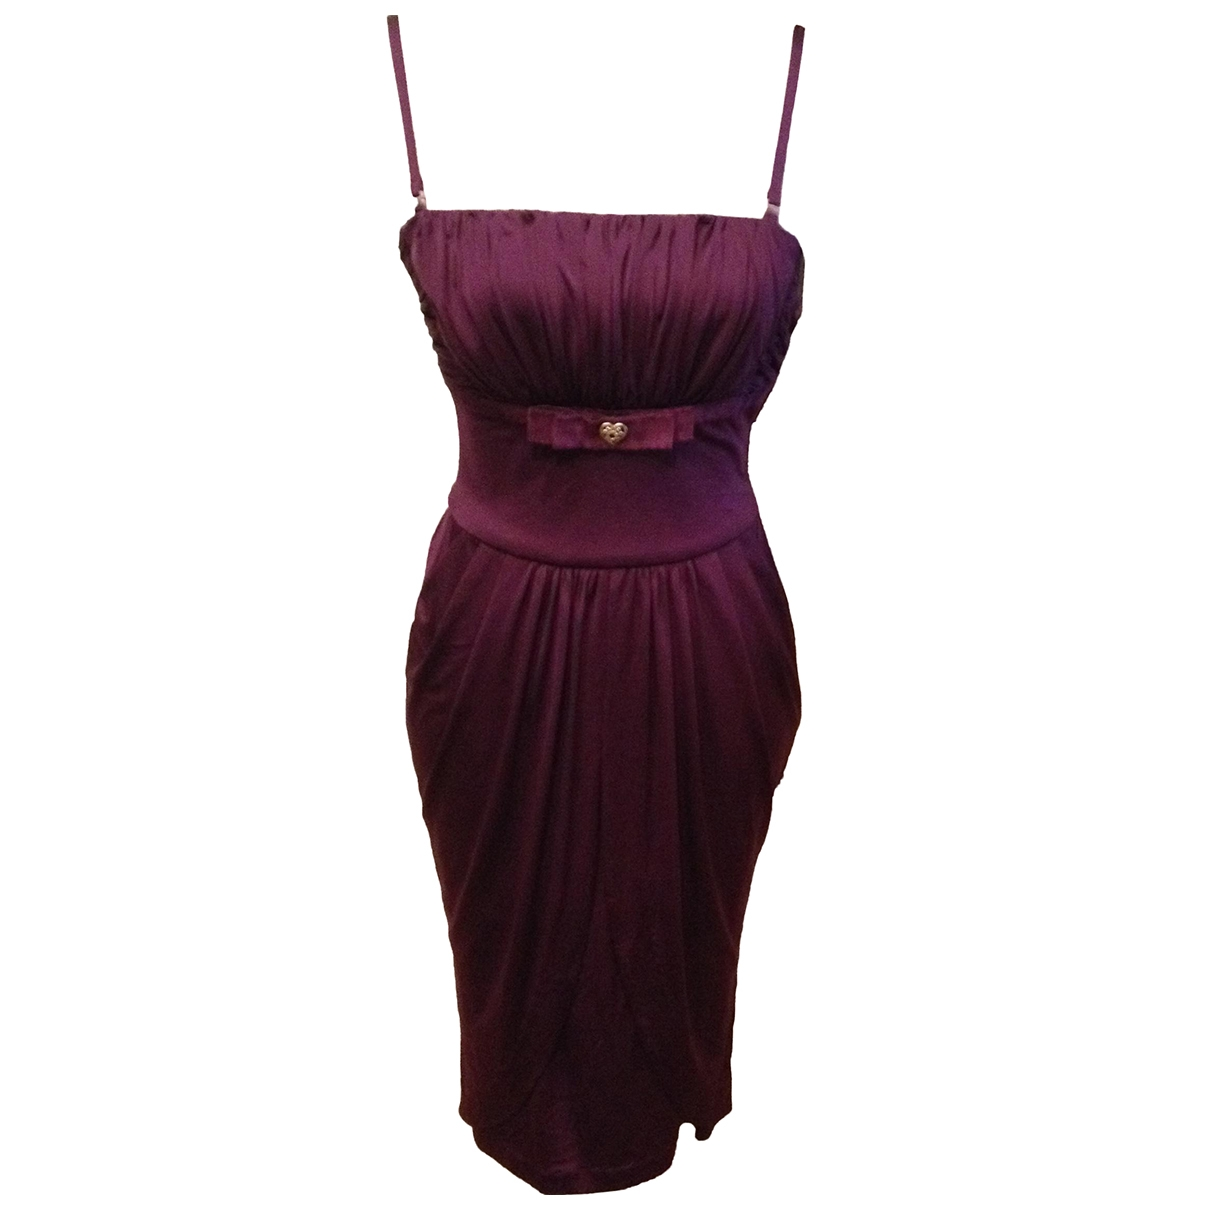 Roberto Cavalli \N Kleid in  Lila Polyester